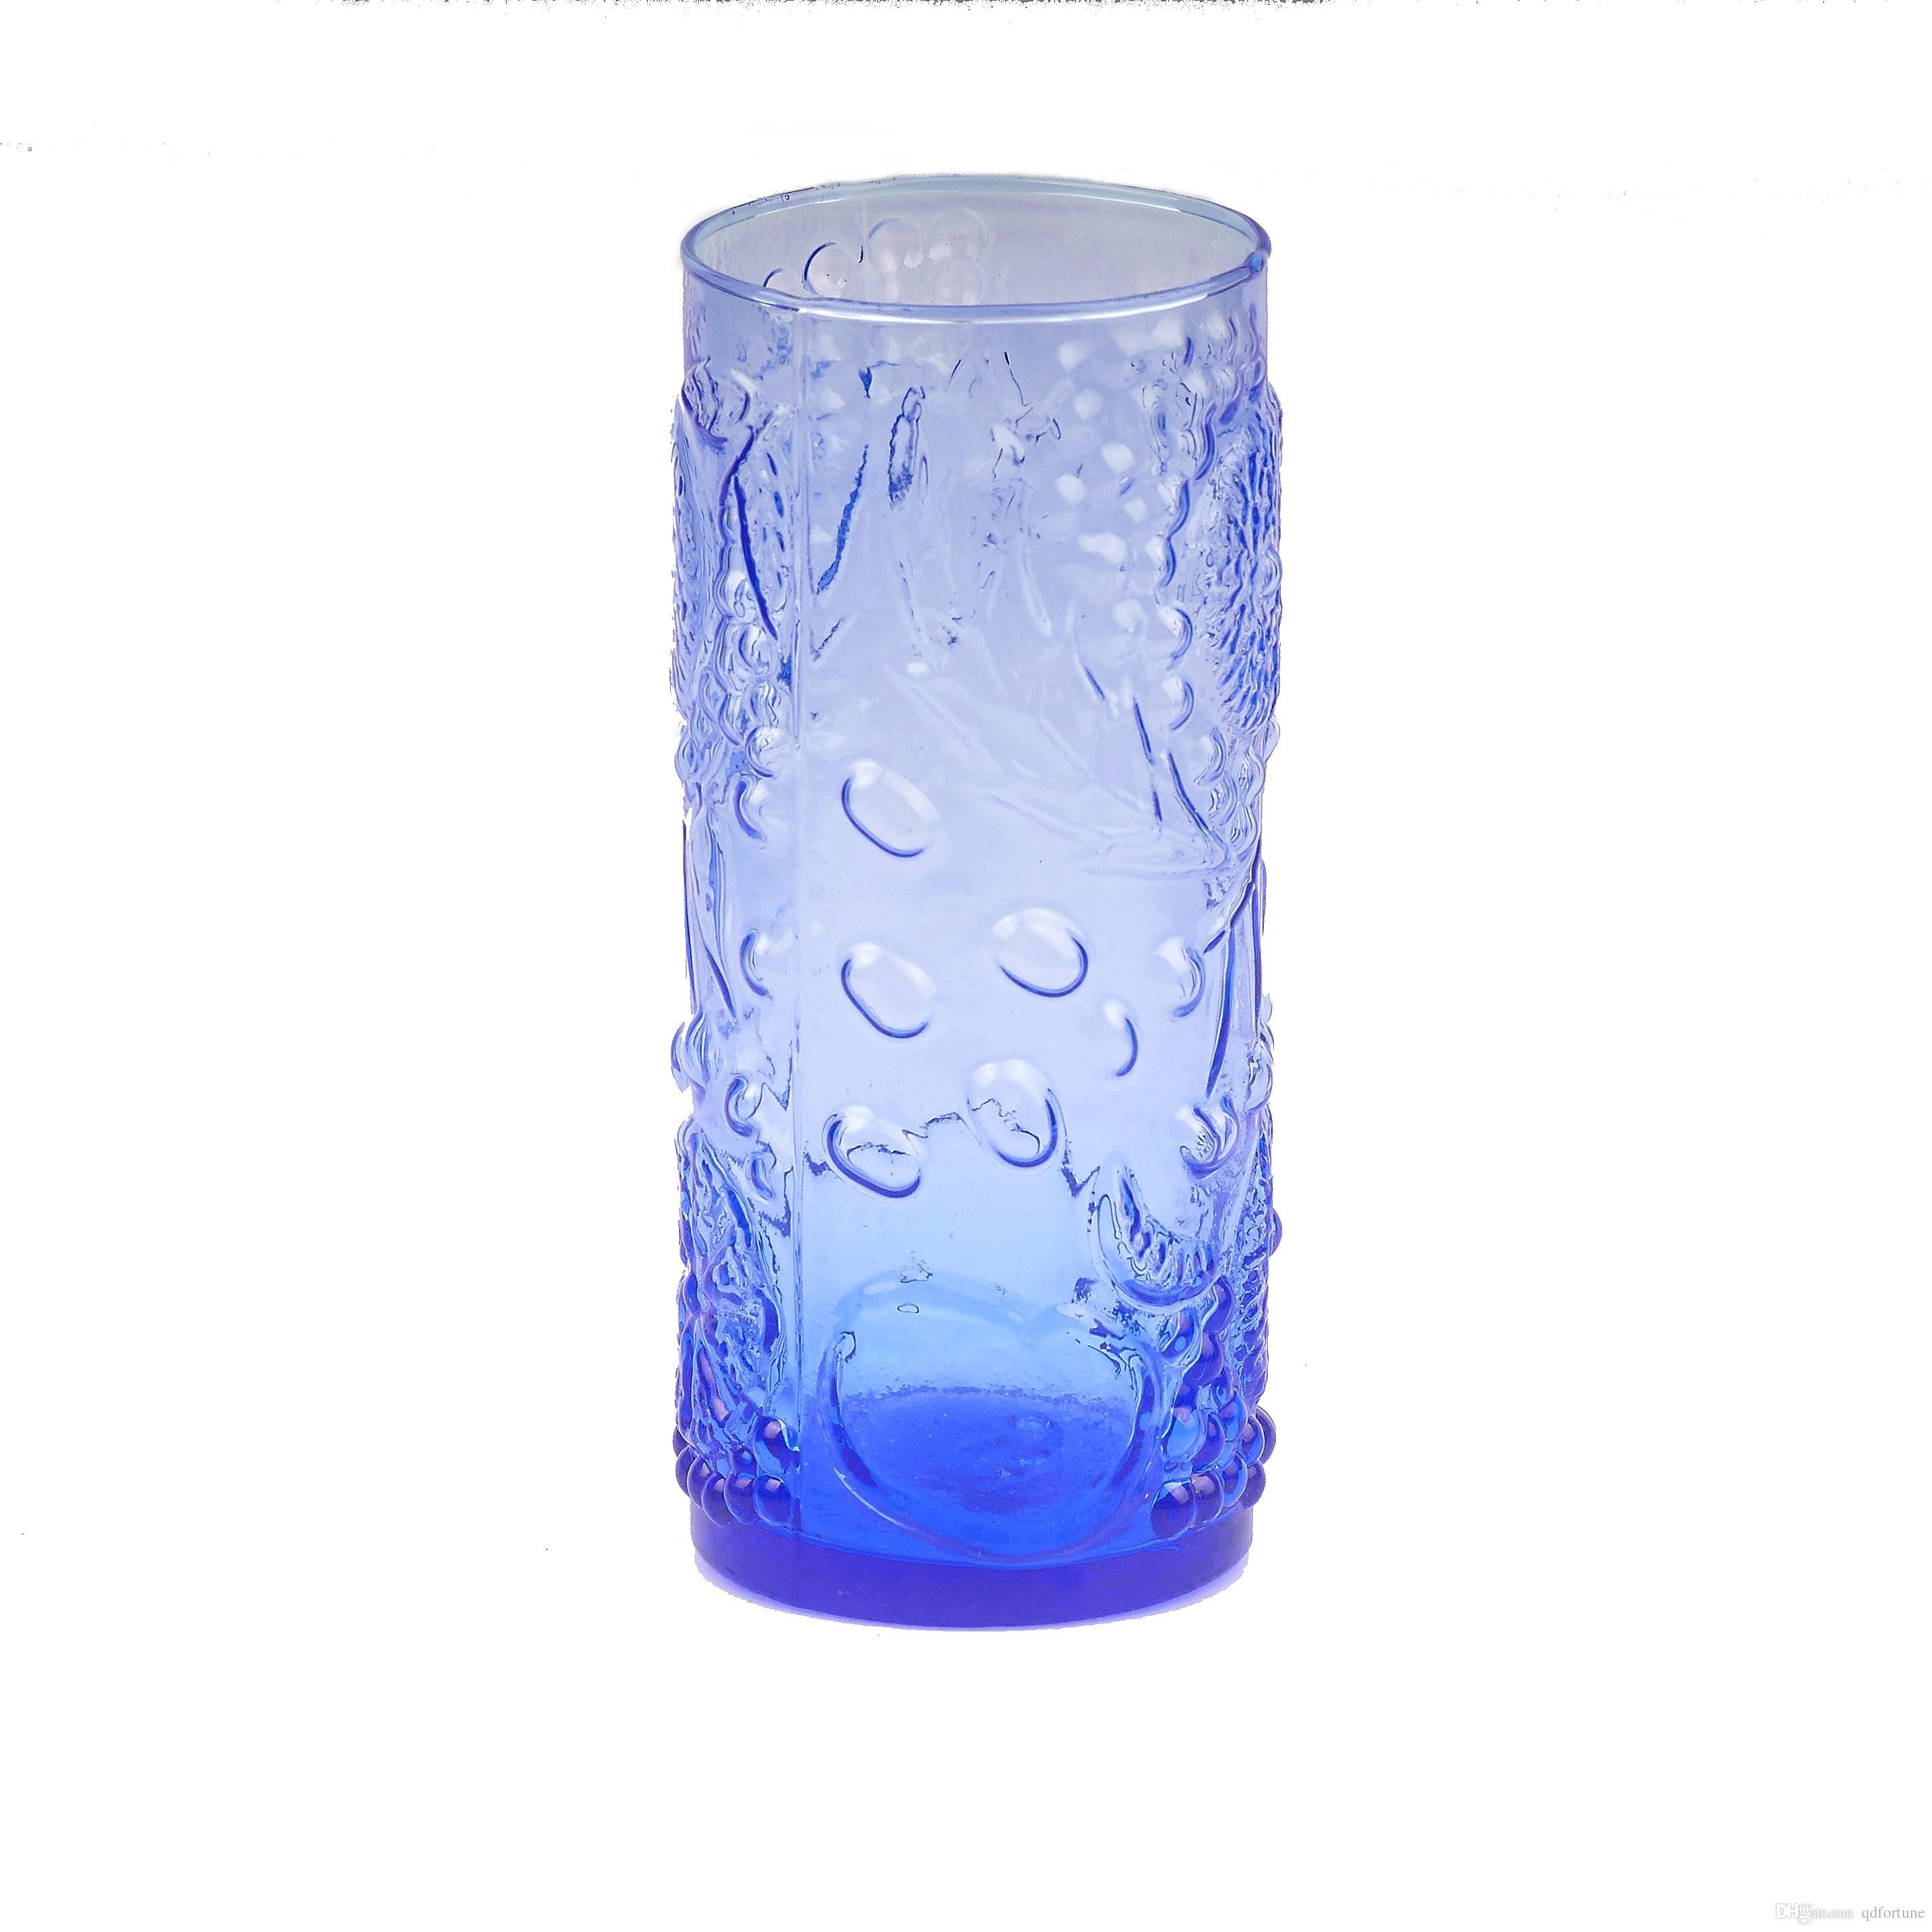 500ML Dark Blue Crystal Fruit decorative pattern Glass Whiskey Wine Drinking Glass Cup Beer Glasses Pint Juice Glass Drinkware vase